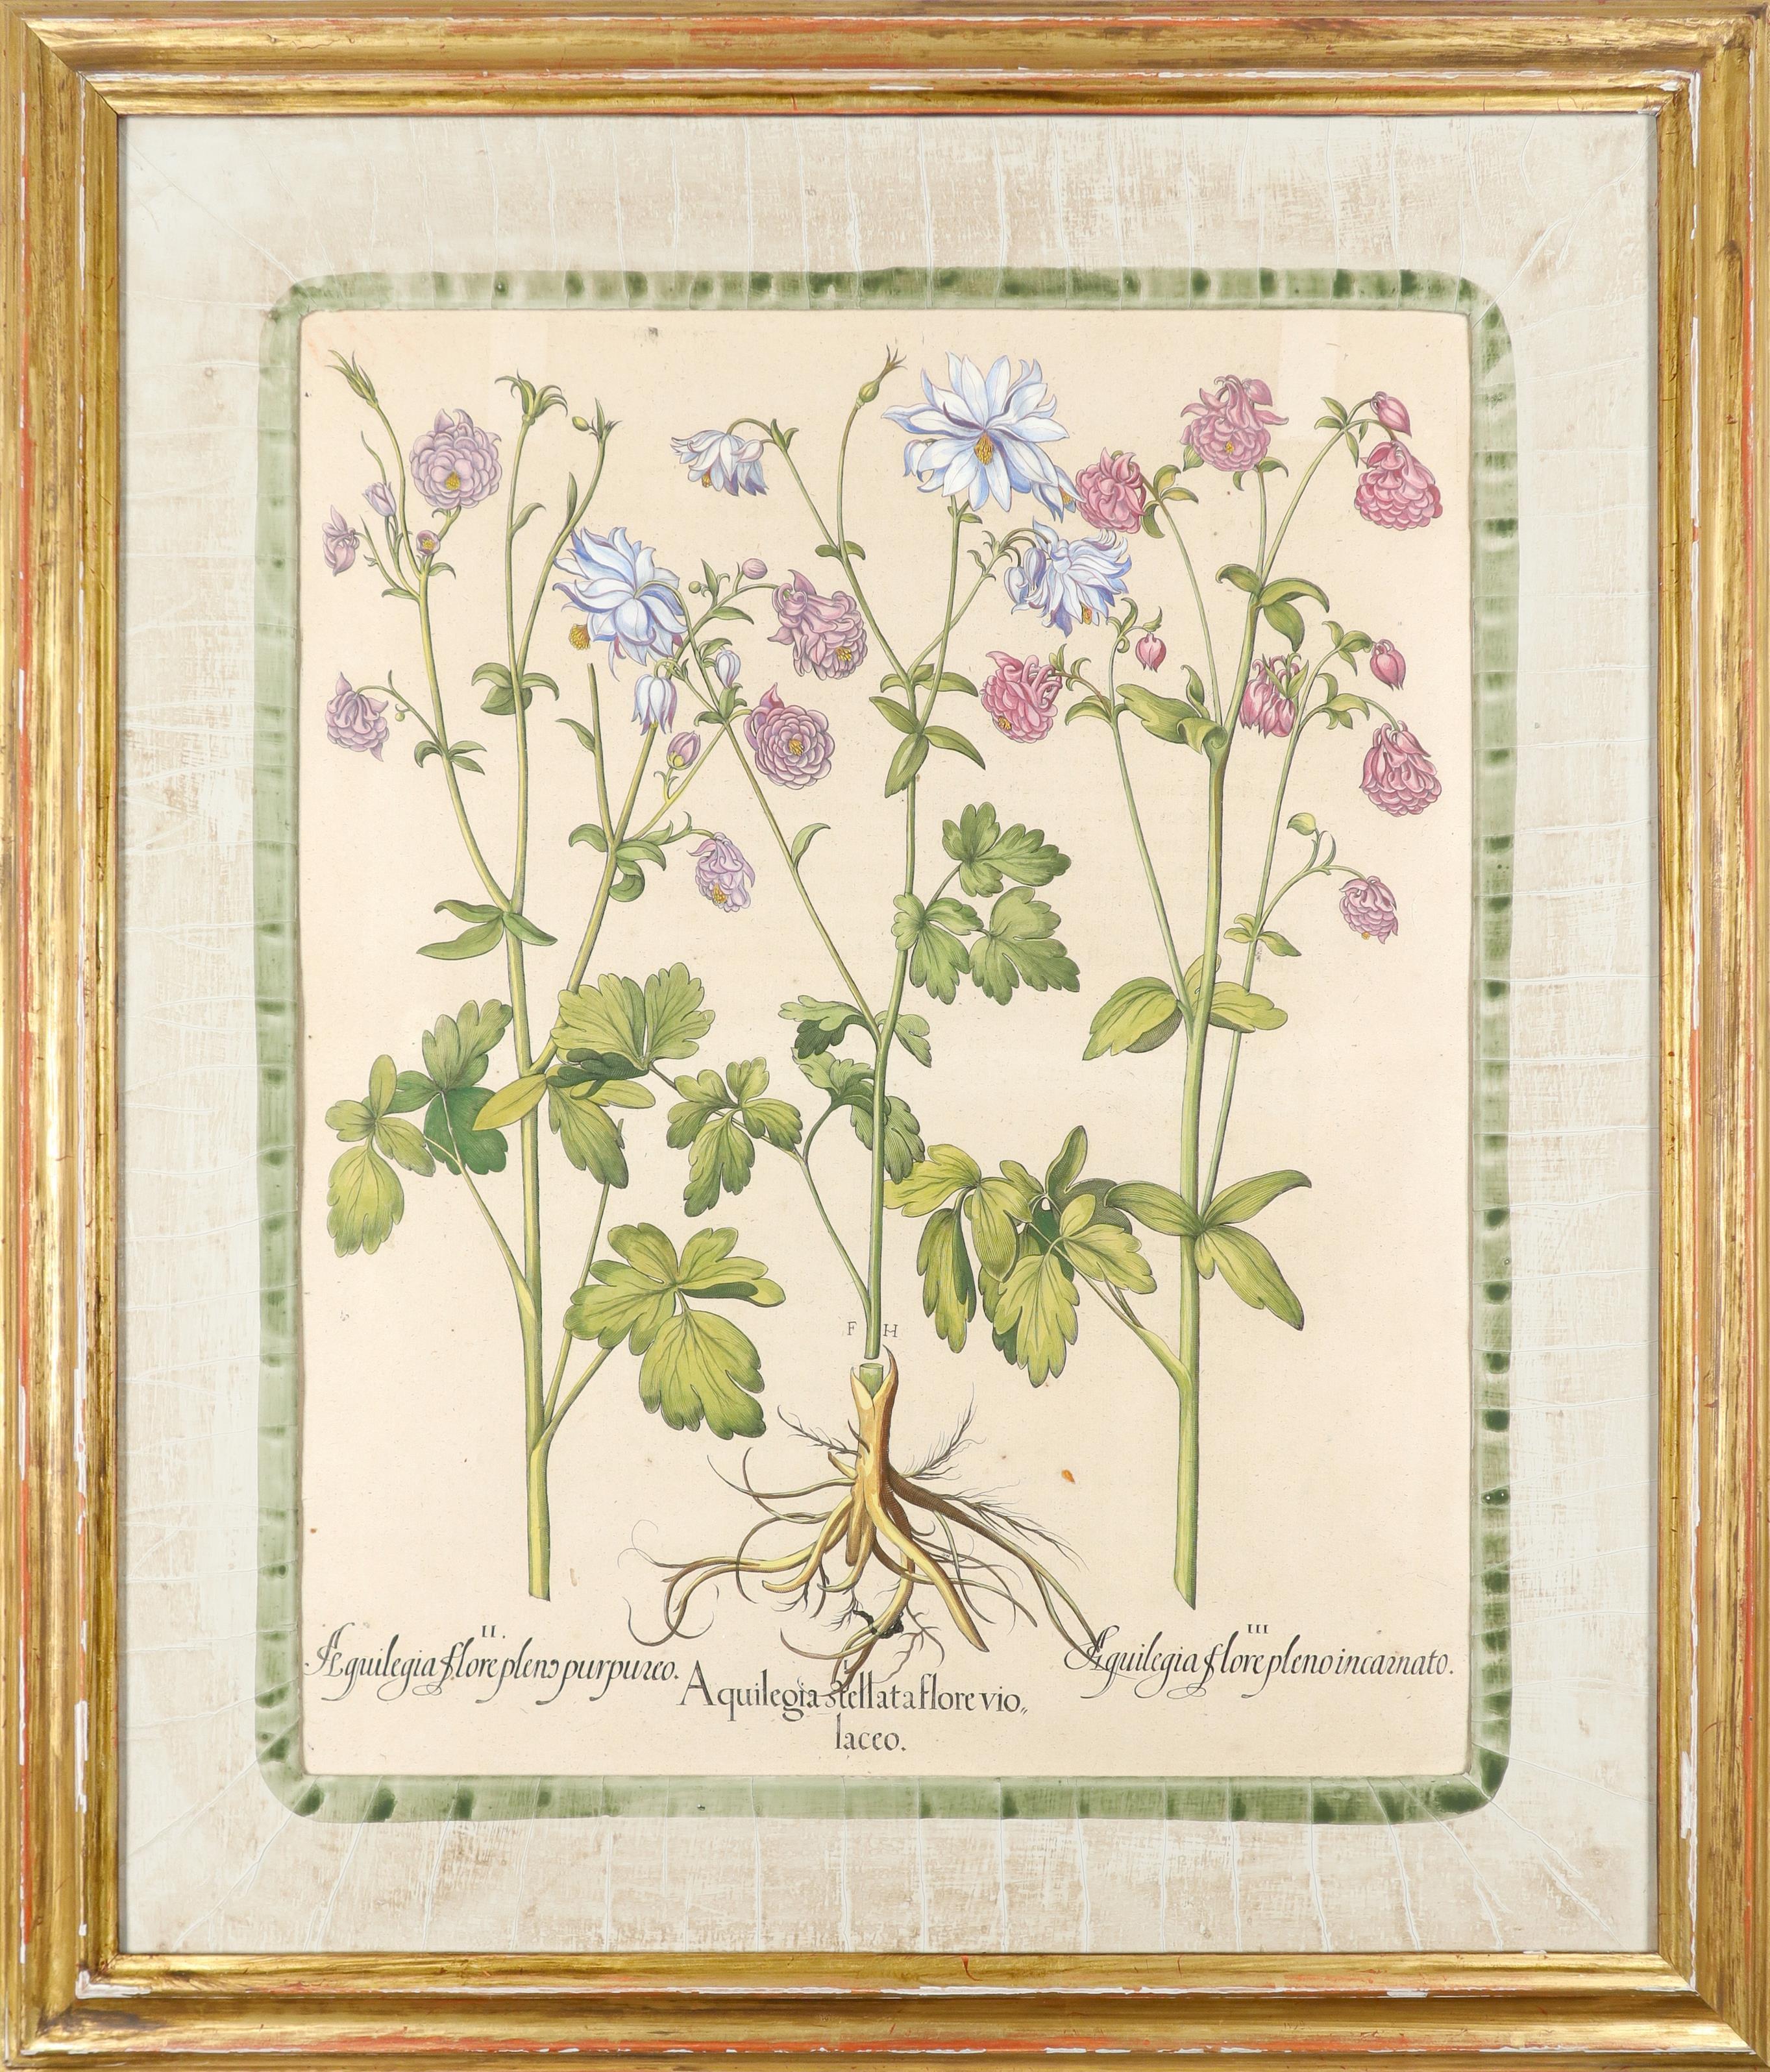 After Basilius Besler Poma flore multiplici; Aquilegia stellata flore vio laceo; Cytisus - Image 5 of 36